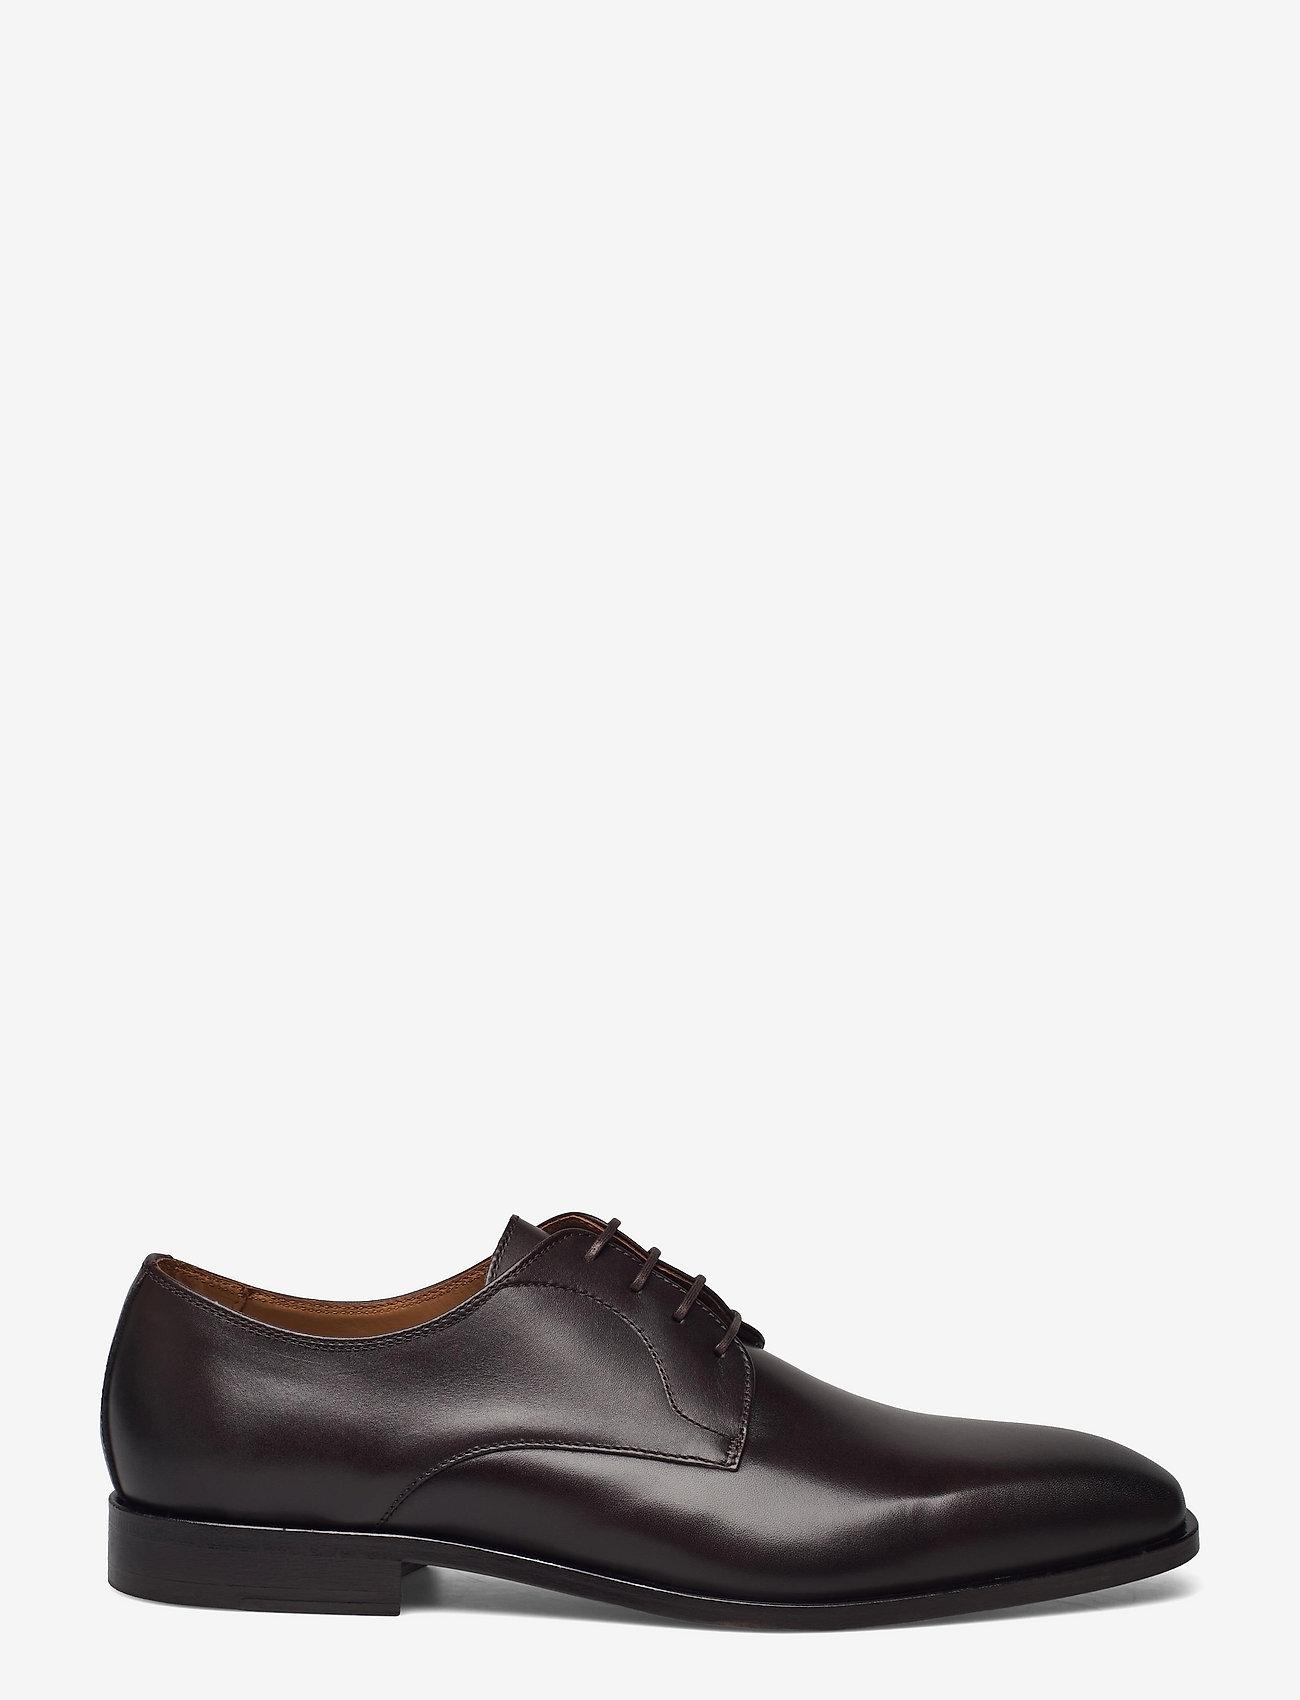 BOSS - Lisbon_Derb_bu1 - chaussures lacées - dark brown - 1